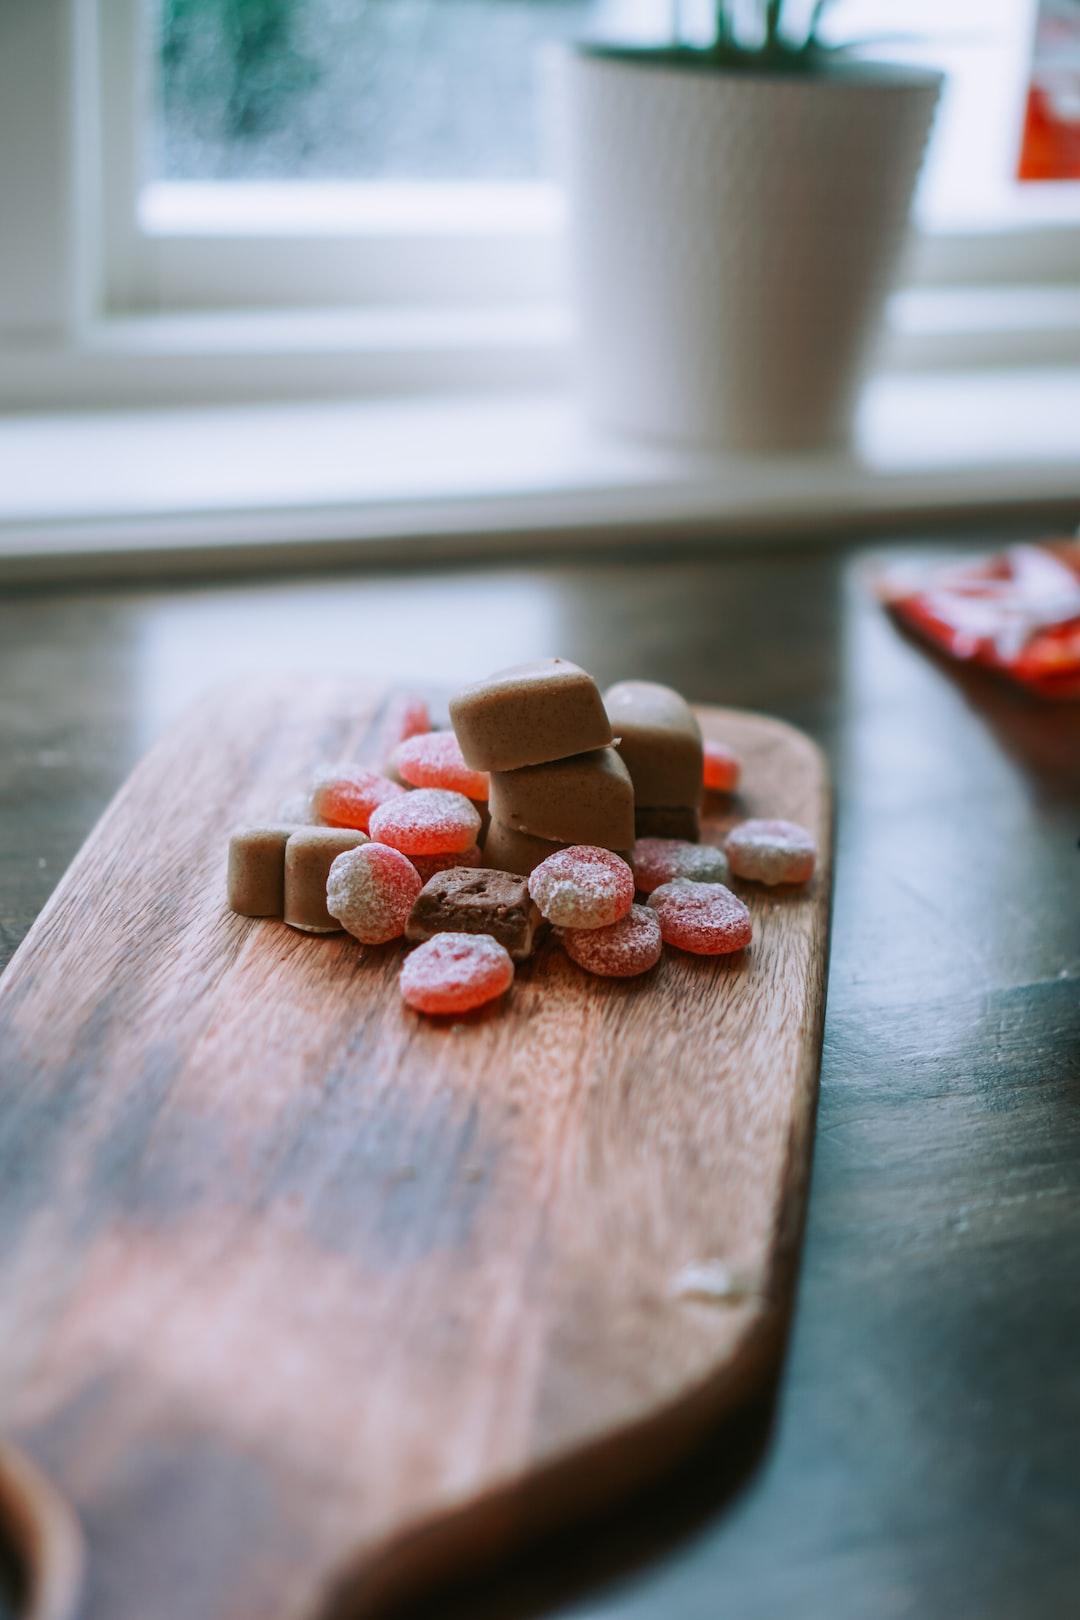 Candy peanut fudge